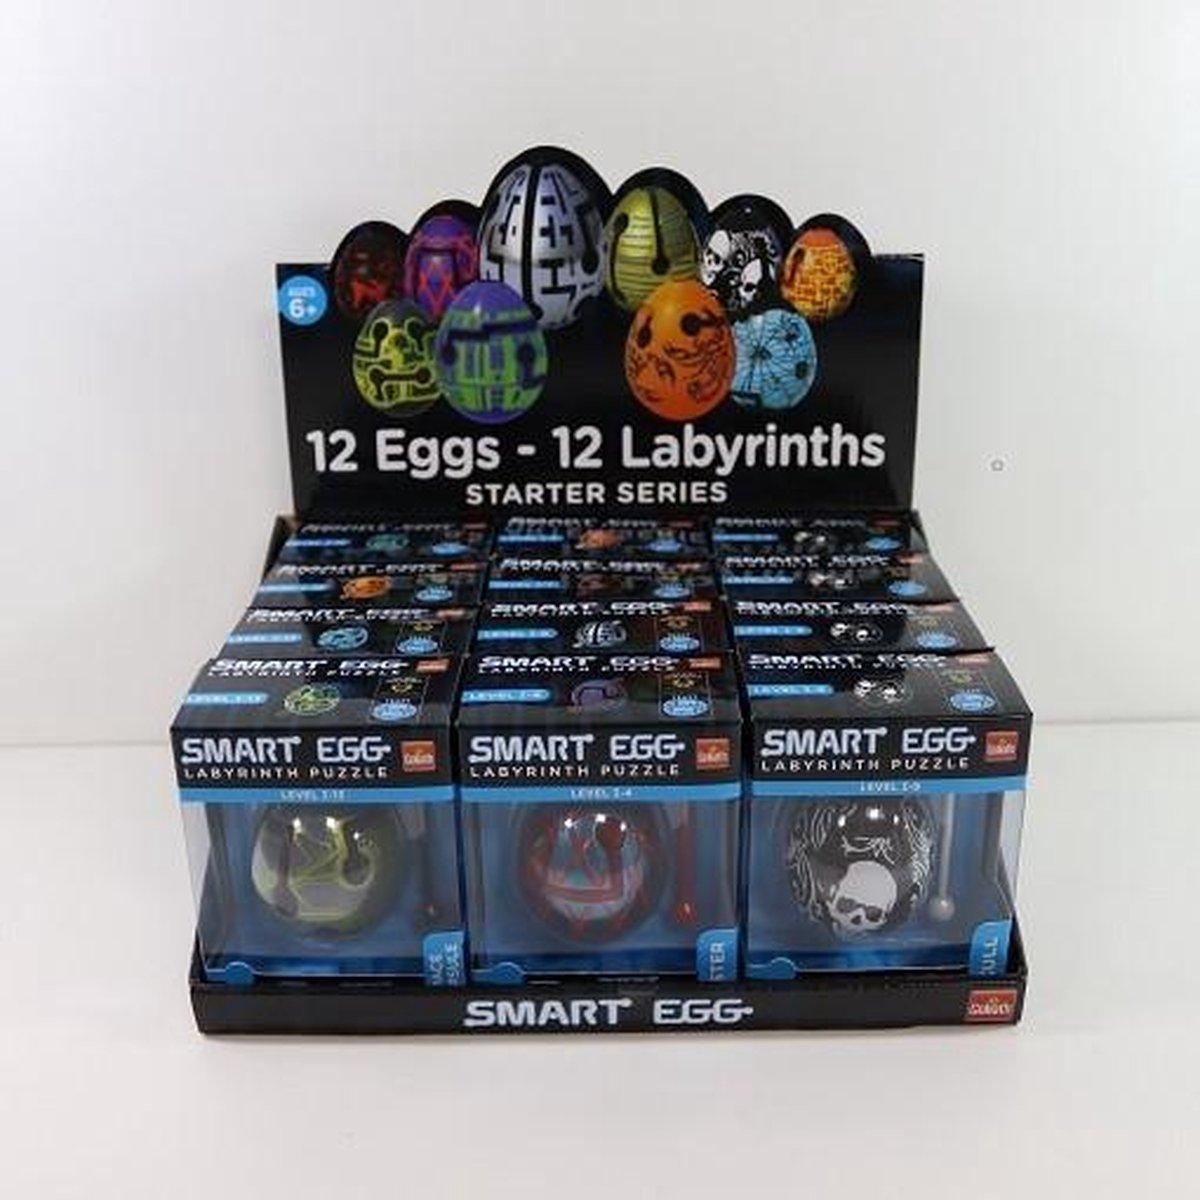 Smart Egg Labyrinth Puzzle 12x